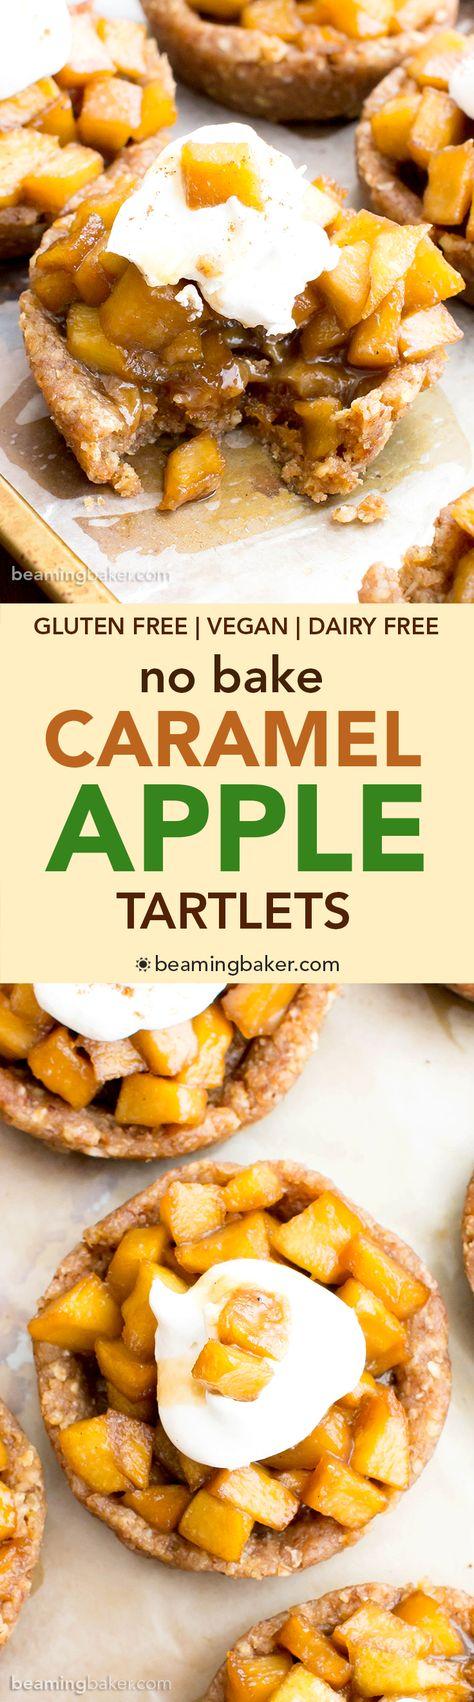 No Bake Caramel Apple Tartlets (V+GF): a whole ingredient recipe for mini caramel pecan tarts bursting with sweet apple flavor. Vegan, Gluten Free, DF.